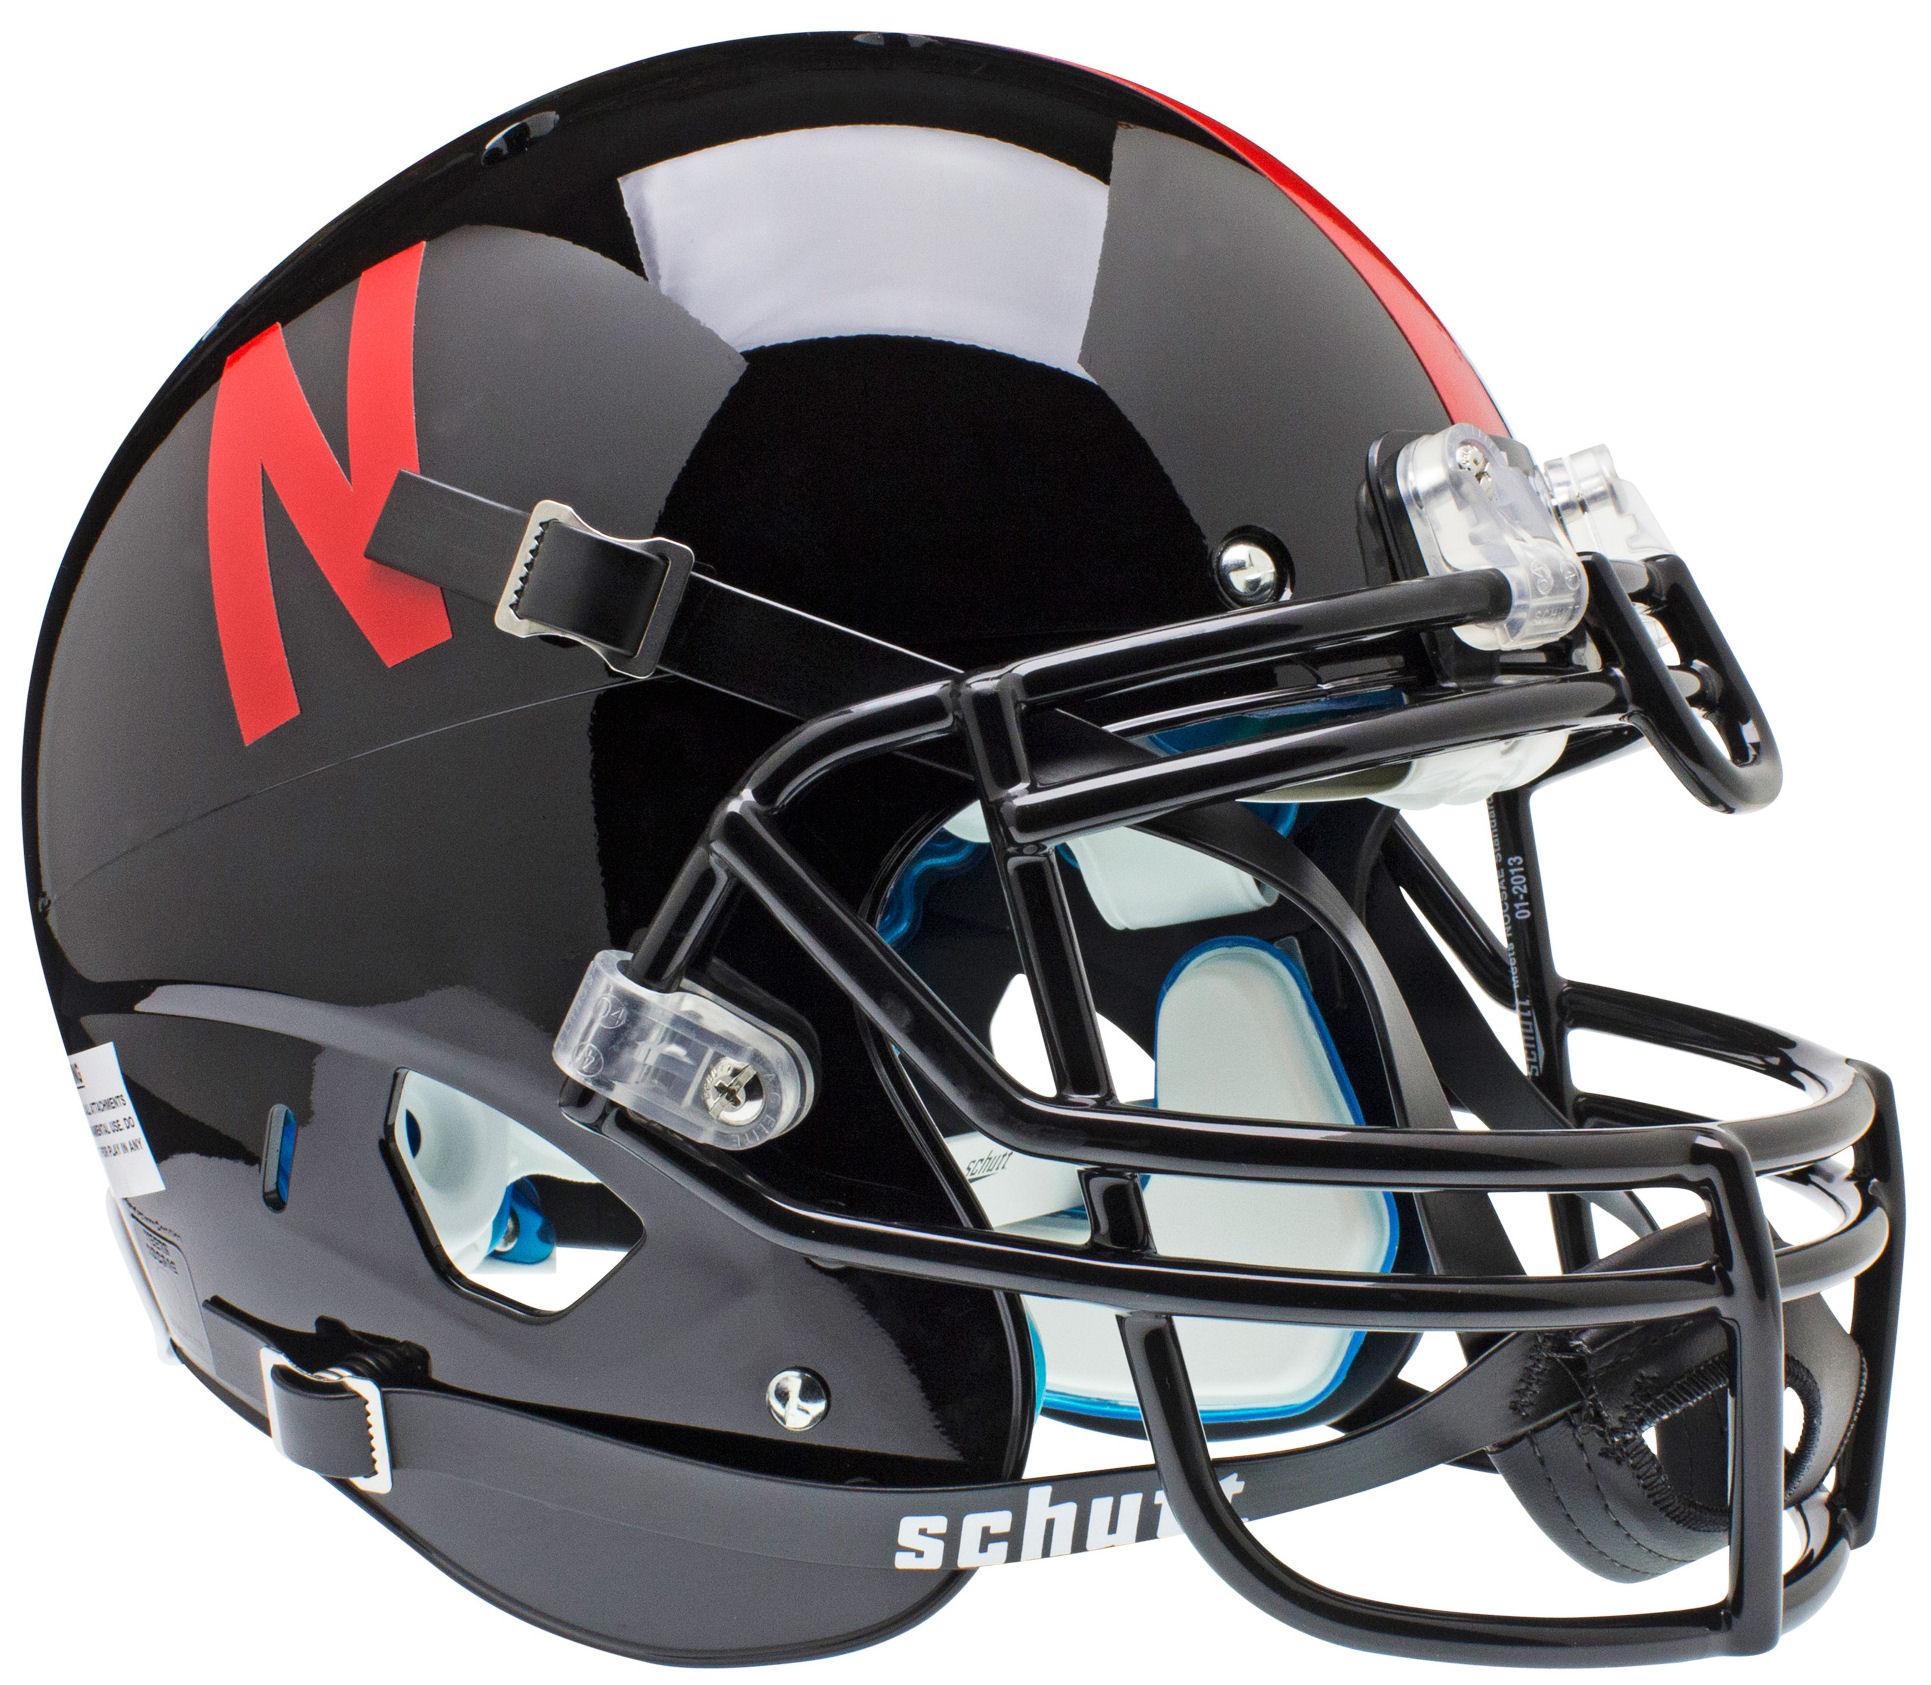 Nebraska Cornhuskers Authentic College XP Football Helmet Schutt <B>Black</B>